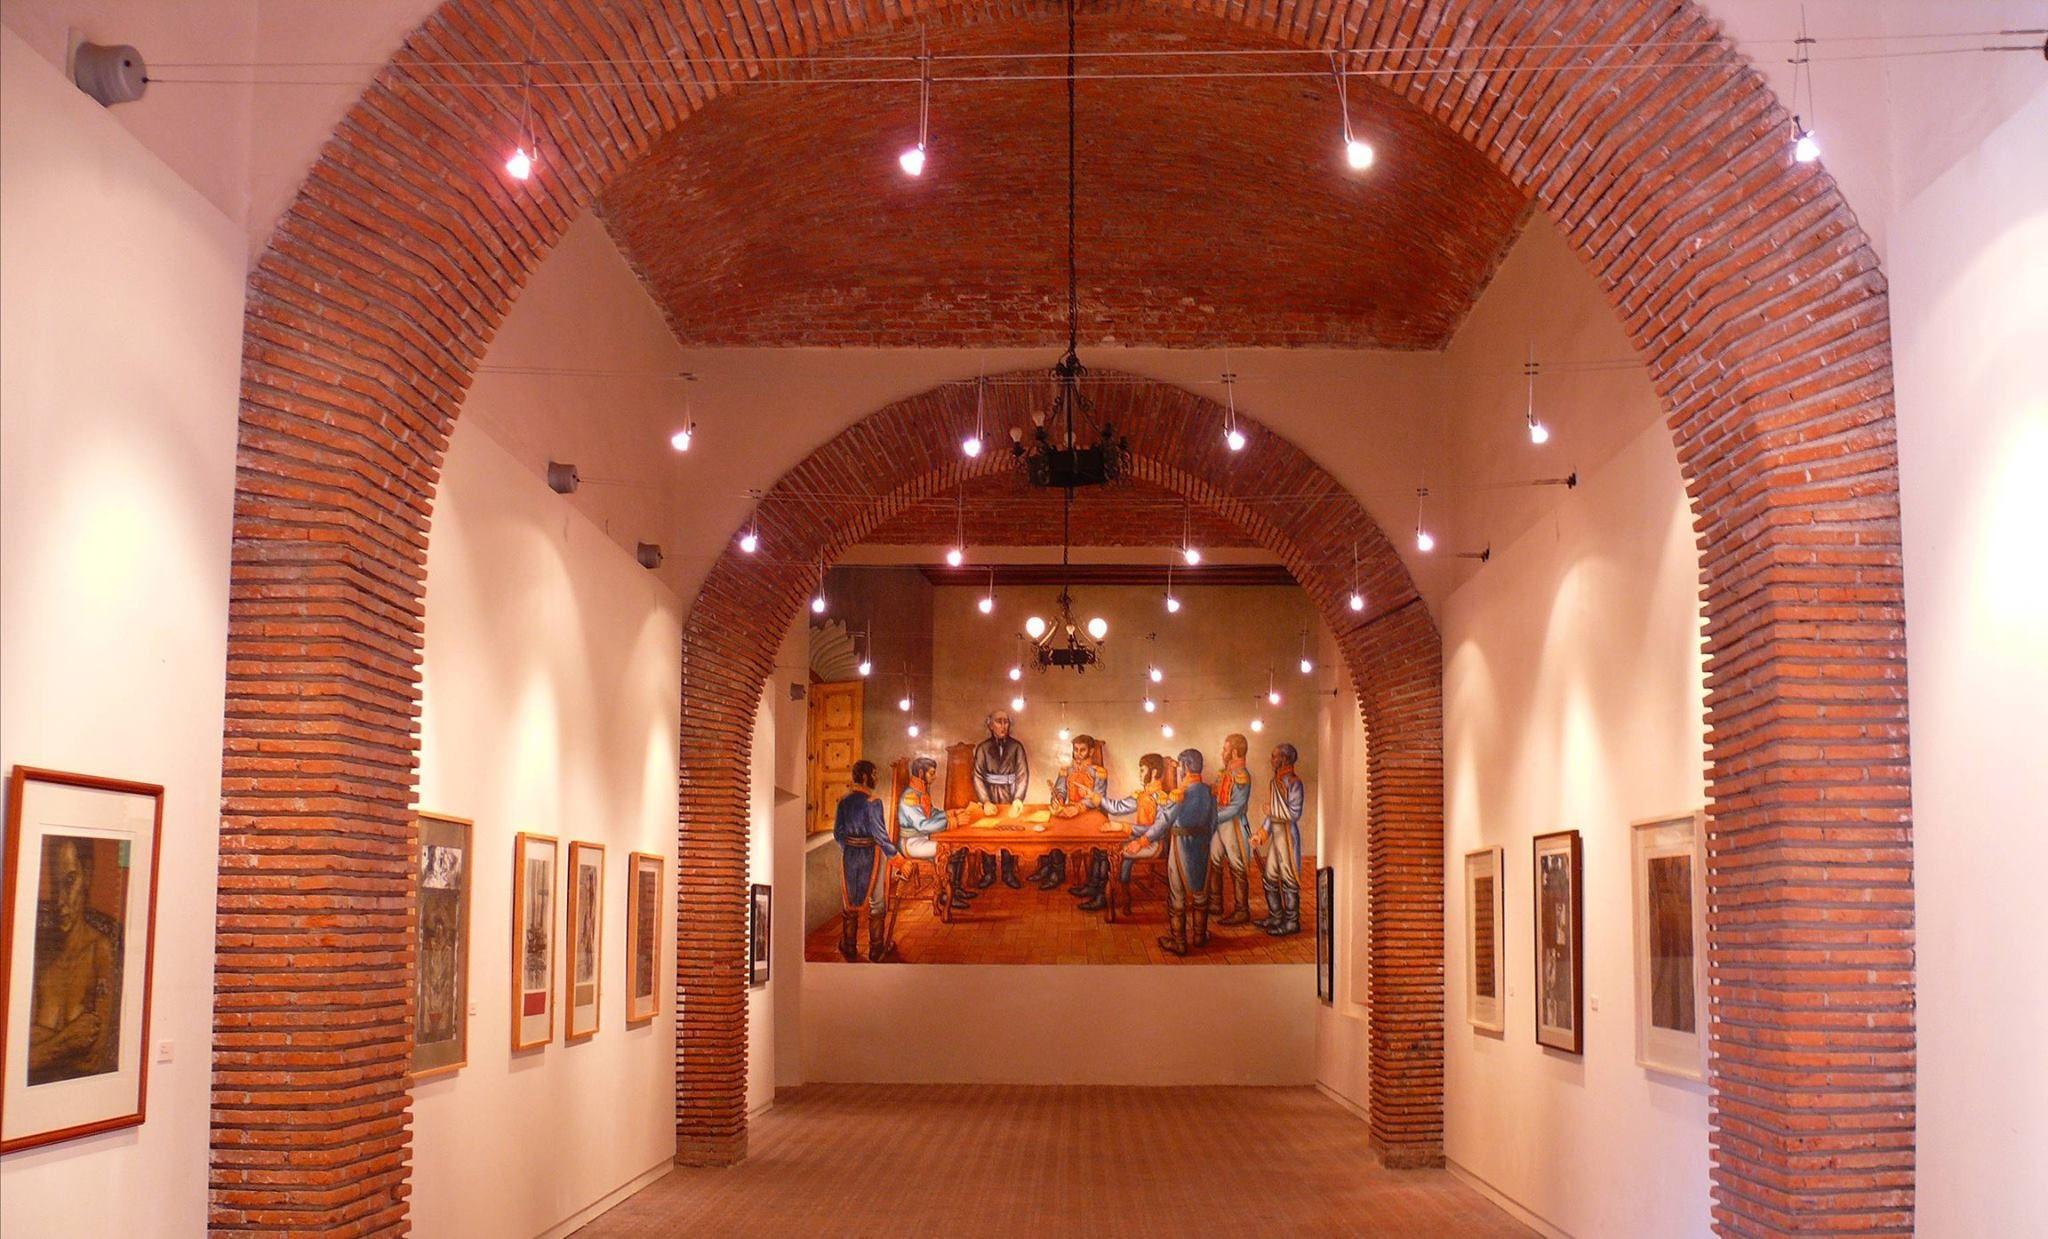 Museo de la Insurgencia #Aguascalientes, Mèxico | Aguascalientes, Museos,  Insurgente